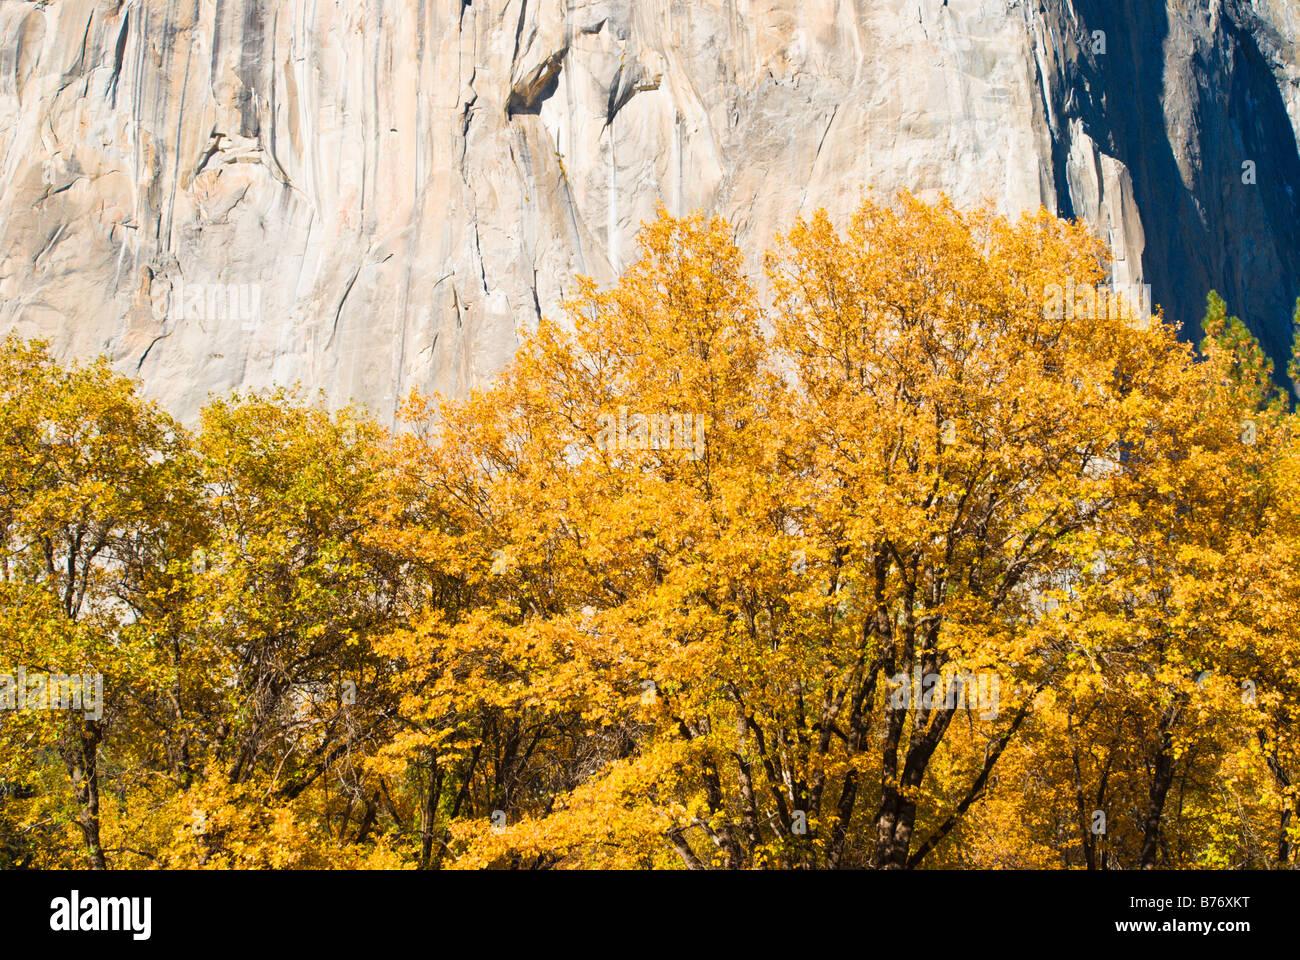 Fall color under El Capitan Yosemite Valley Yosemite National Park California Stock Photo